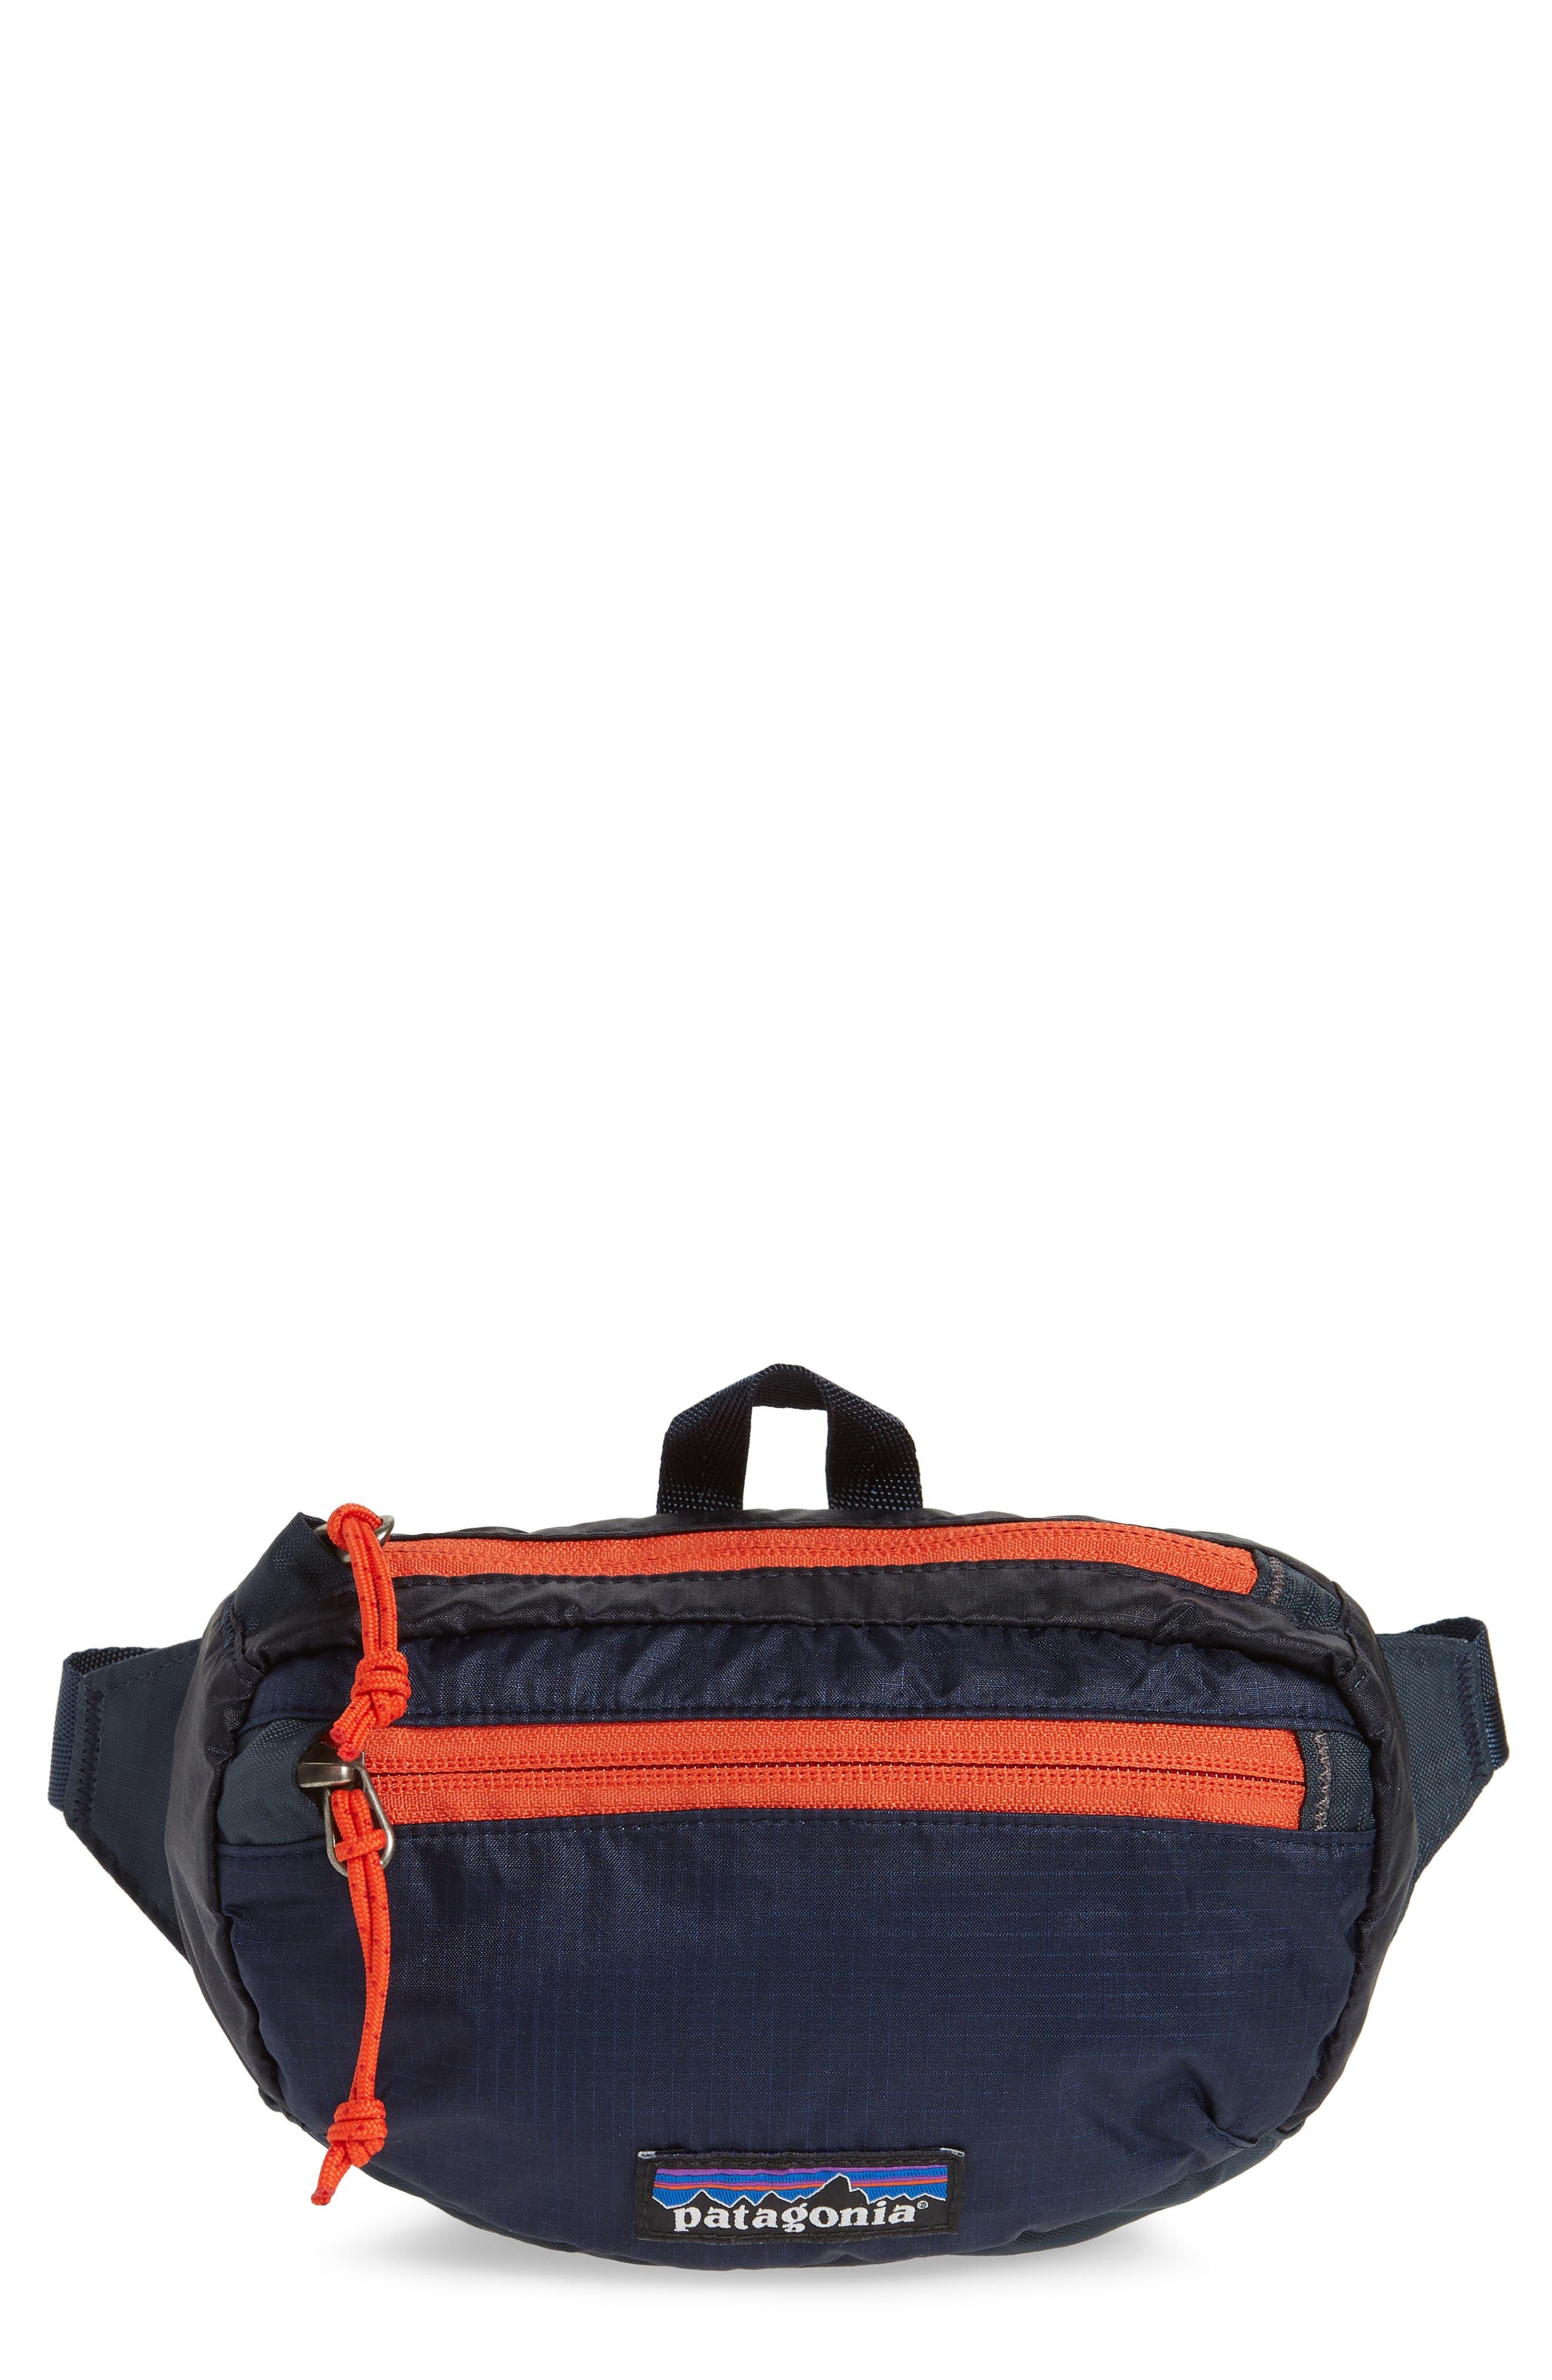 Travel Belt Bag,                             Main thumbnail 2, color,